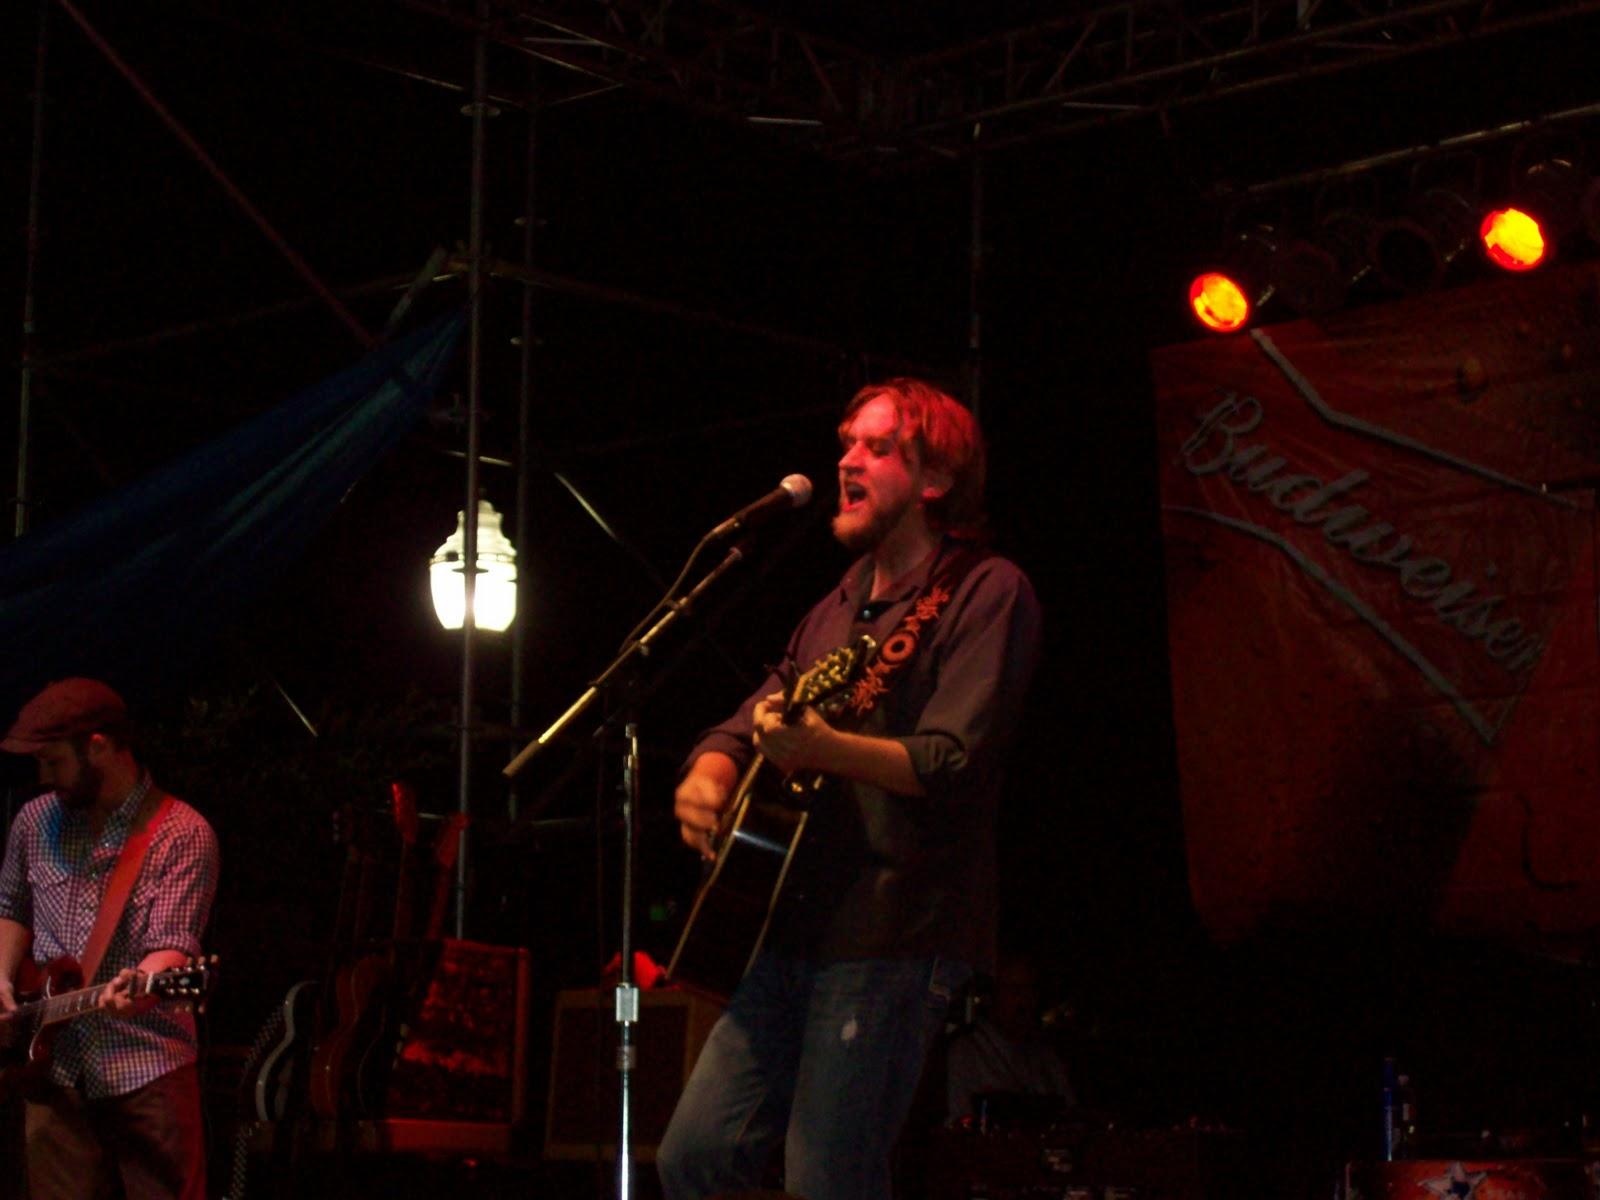 Conroe Cajun Catfish Festival - 101_0503.JPG